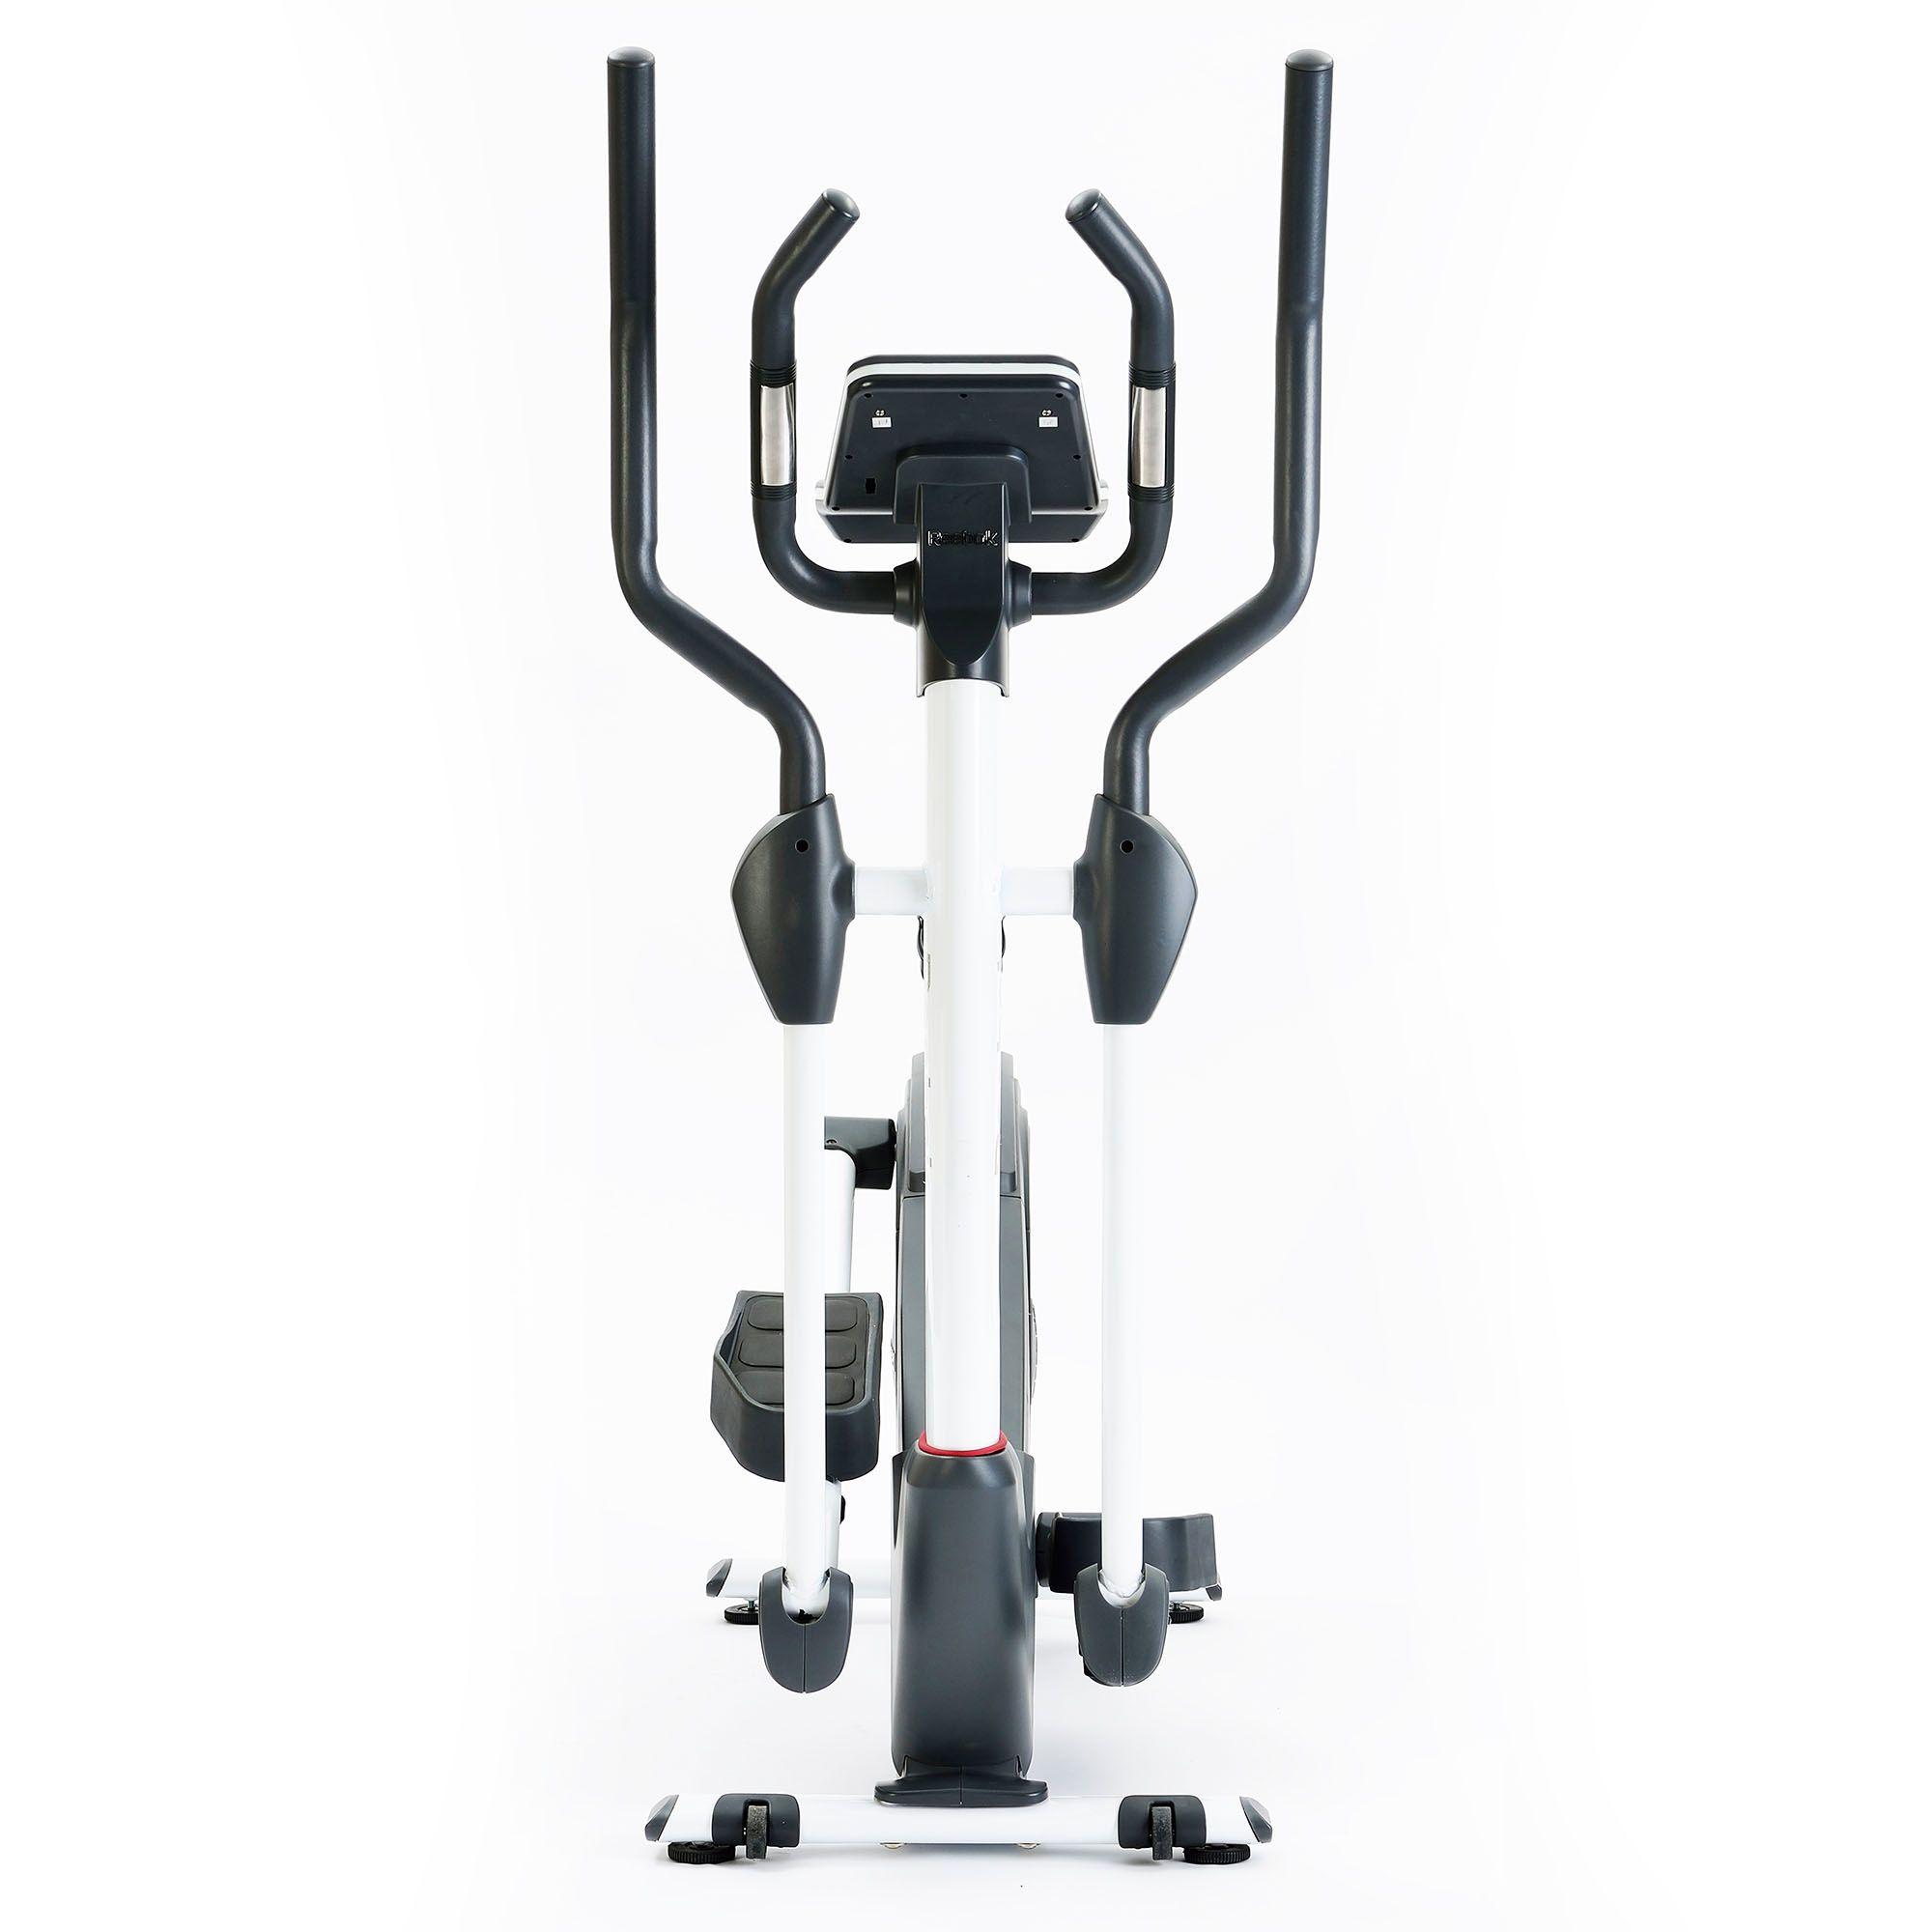 Lifemax Elliptical Bike: Reebok Titanium TX1.0 Elliptical Cross Trainer